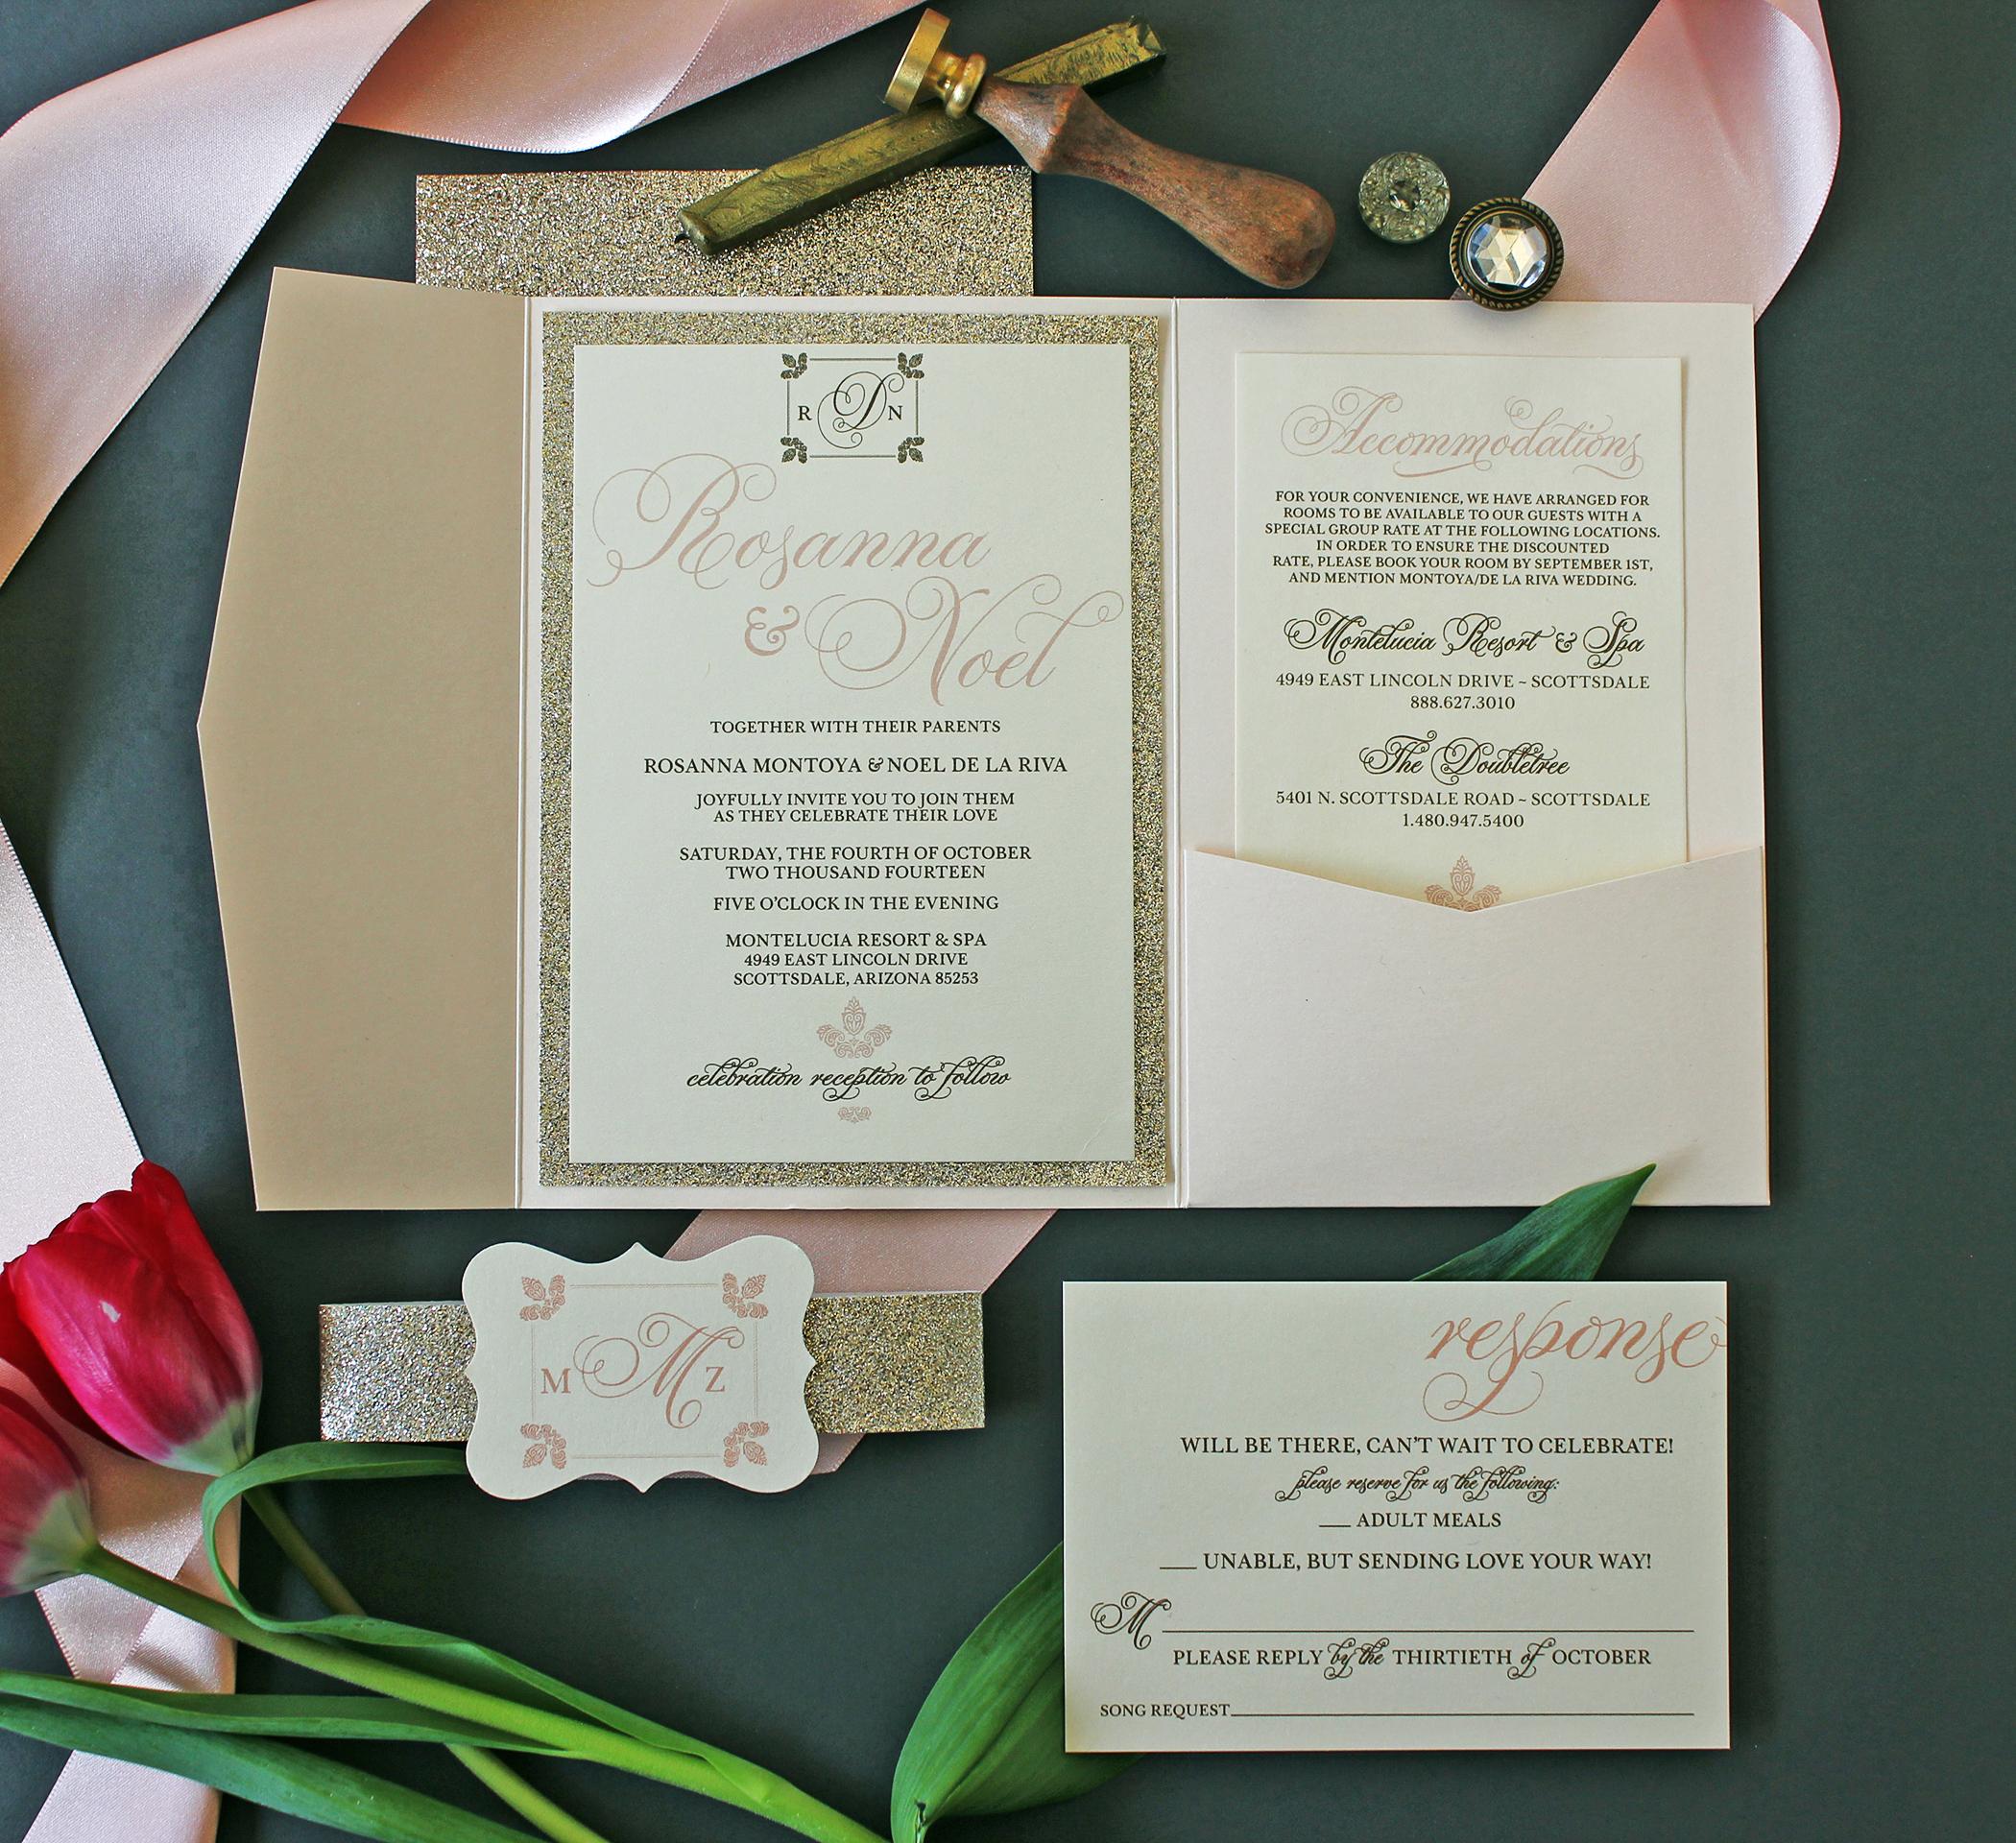 Wedding Invitations Albuquerque: Elegant Champagne Blush & Gold Glitter Invitation Package